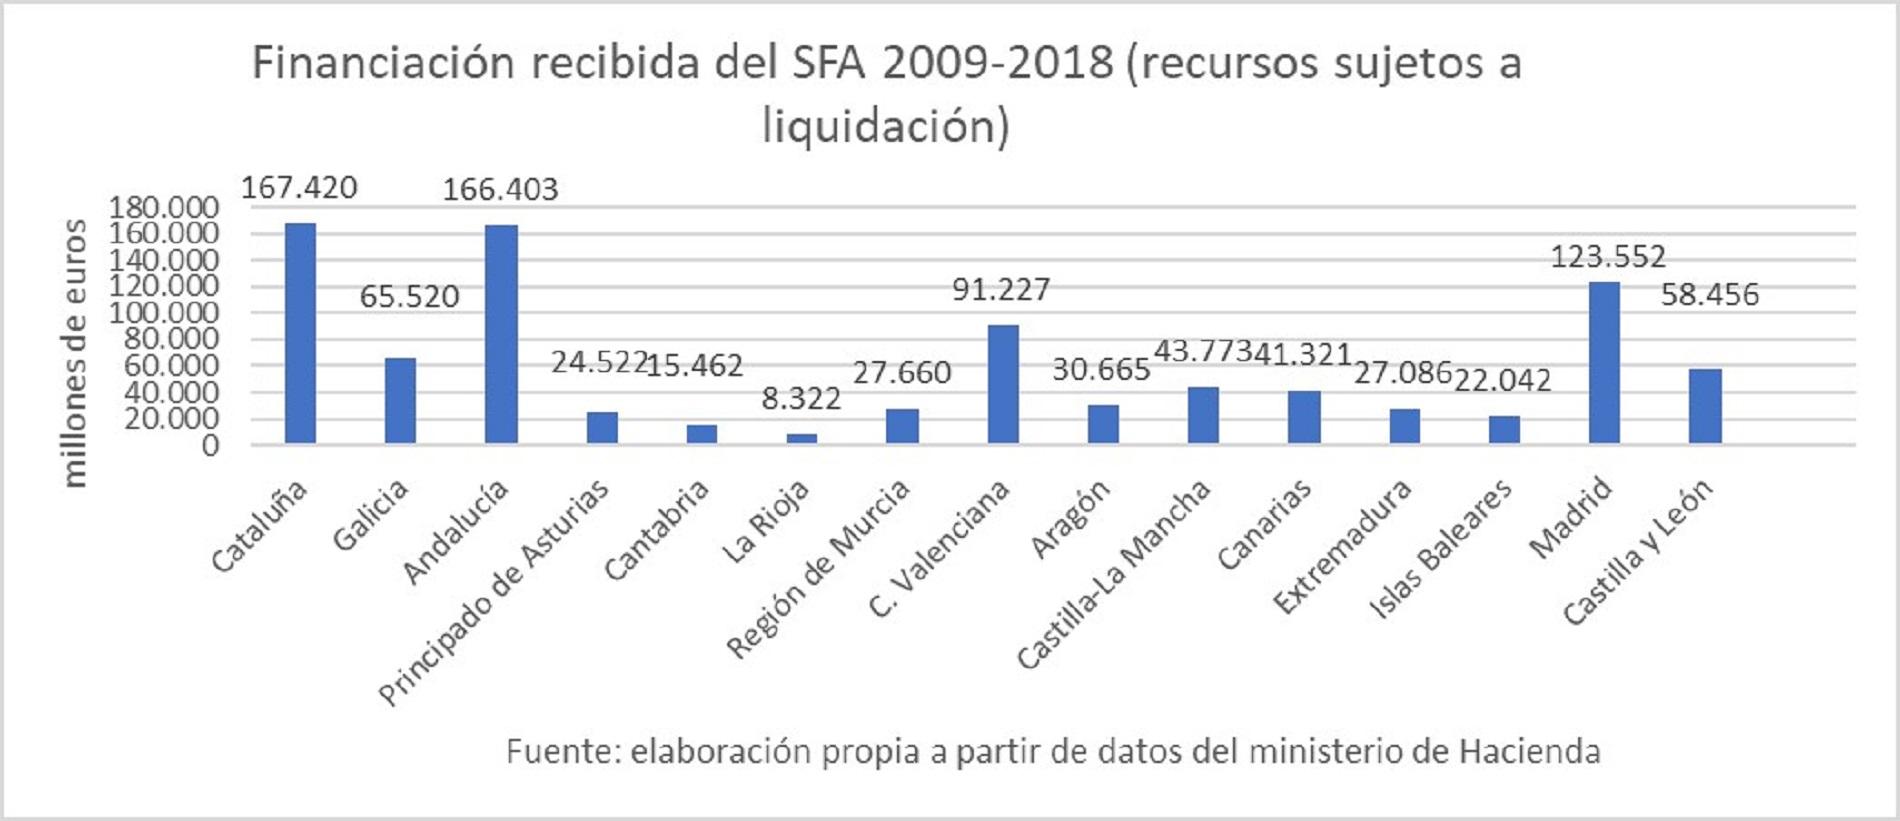 financiacion-recibida-sfa-2009-2018.jpg